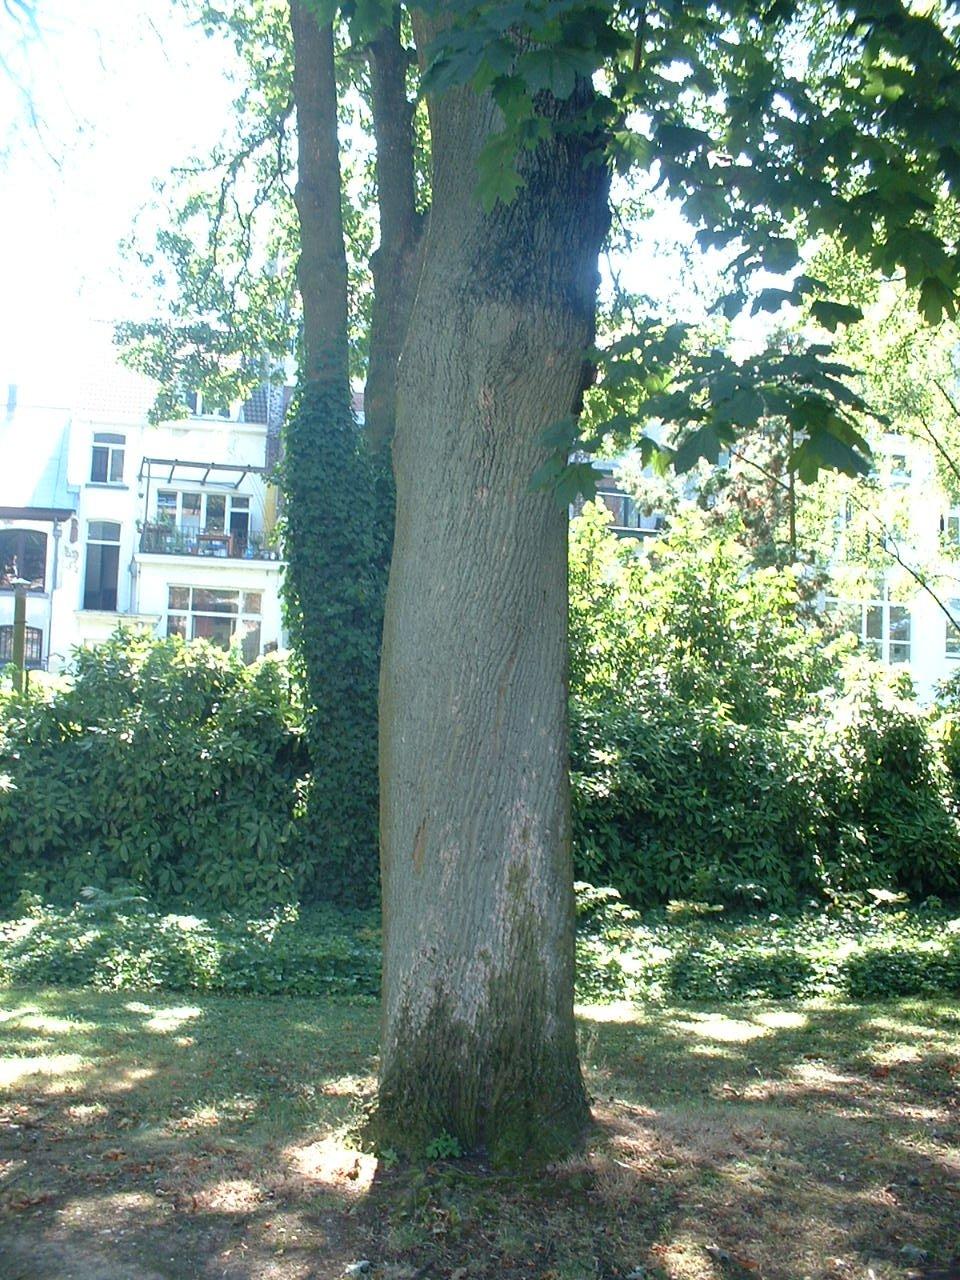 Erable plane – Forest, Jardin de l'école normale de Berkendael, Rue Berkendael, 70 –  18 Juillet 2006